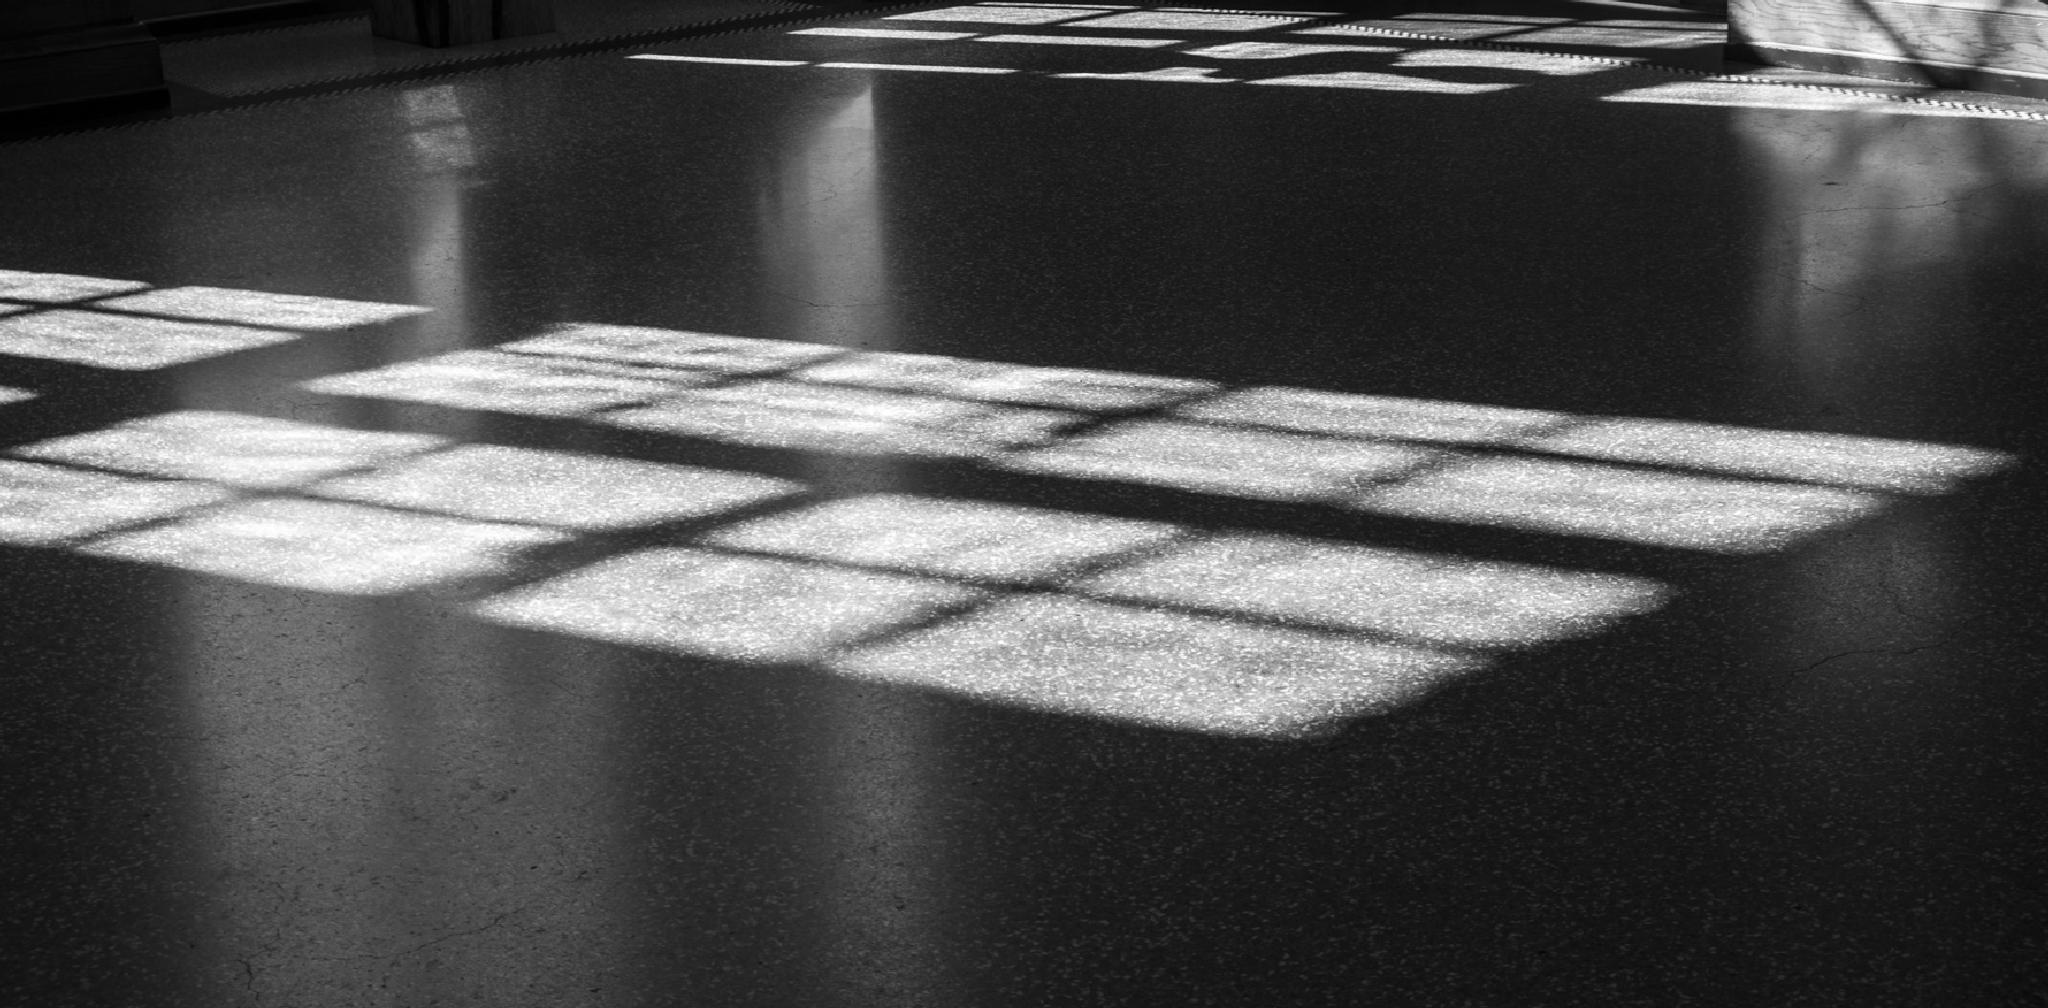 Shadows by Dorit Bach